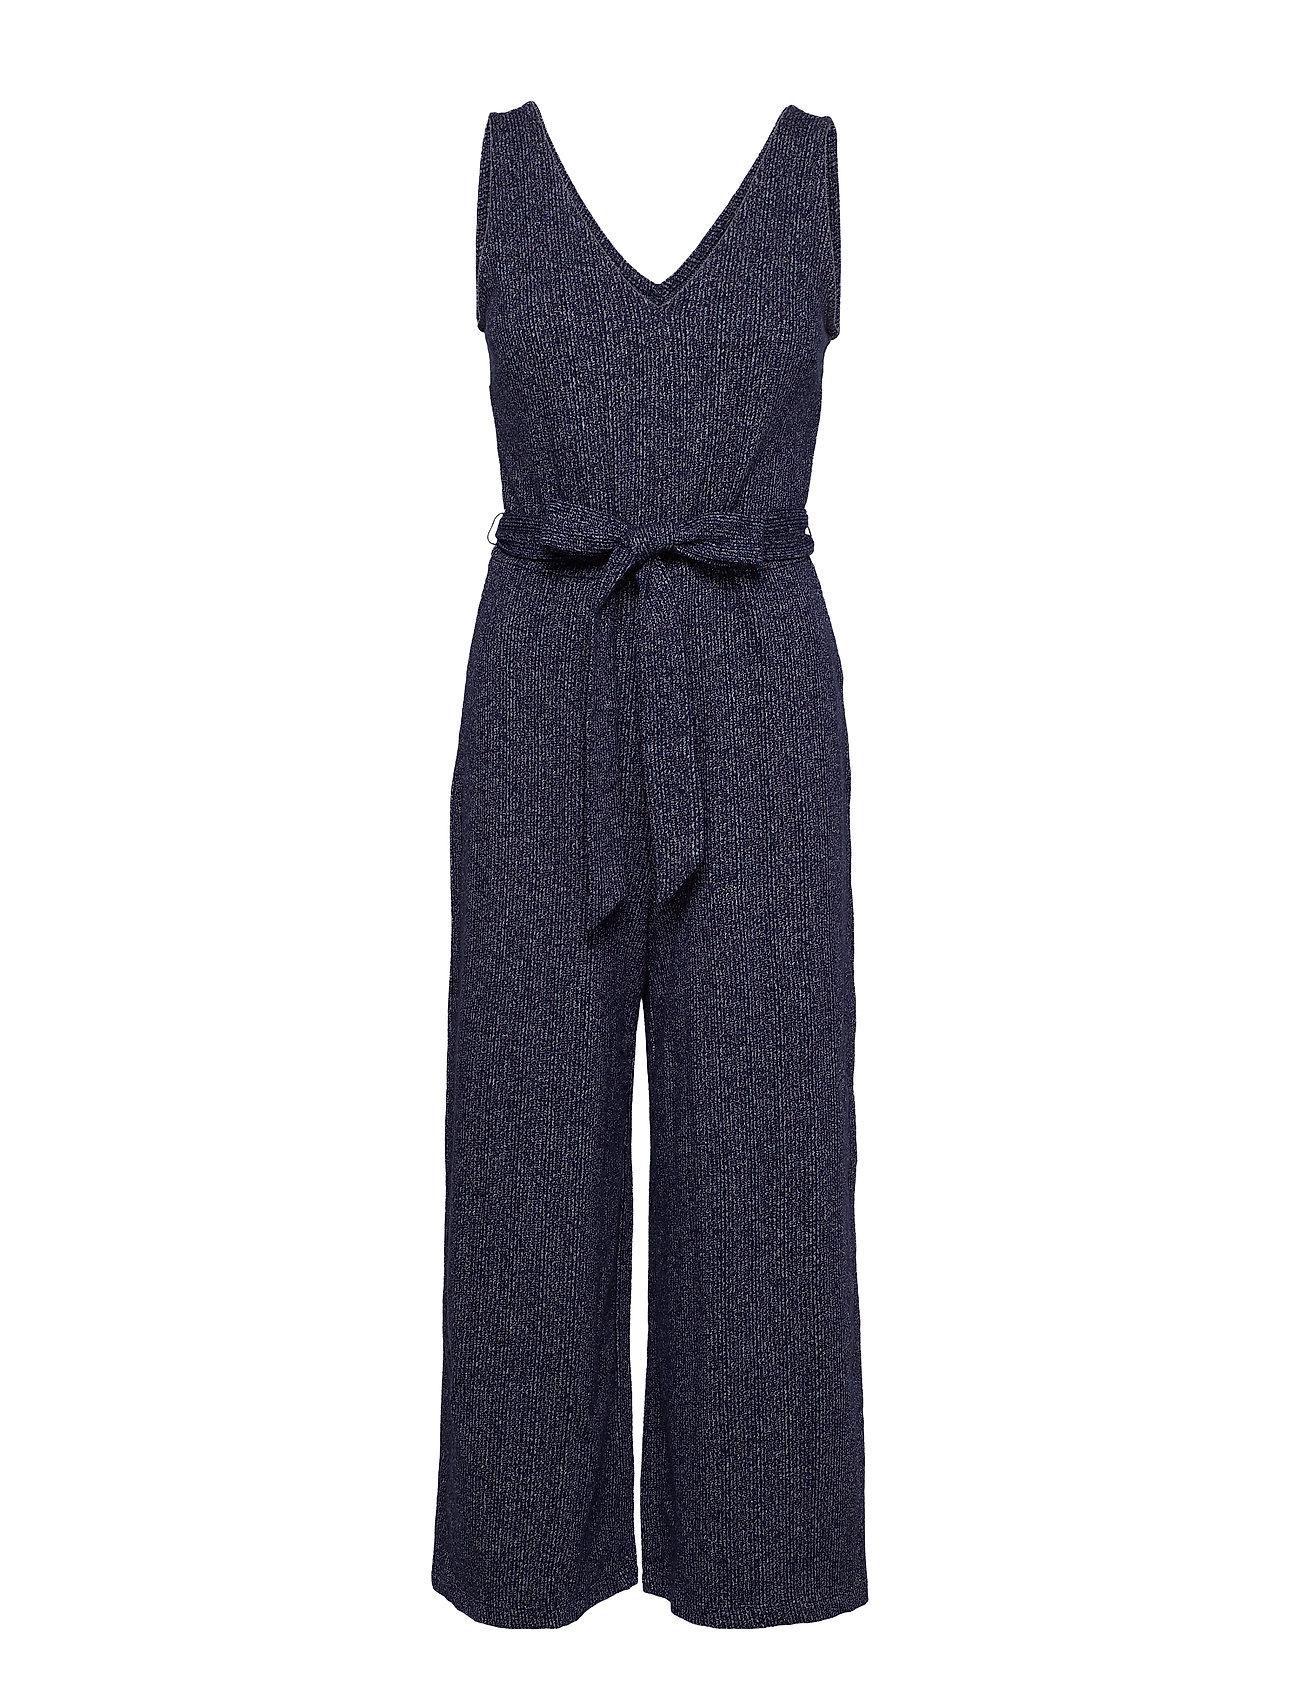 GAP Sleeveless Ribbed Knit V-Neck Jumpsuit - NAVY UNIFORM